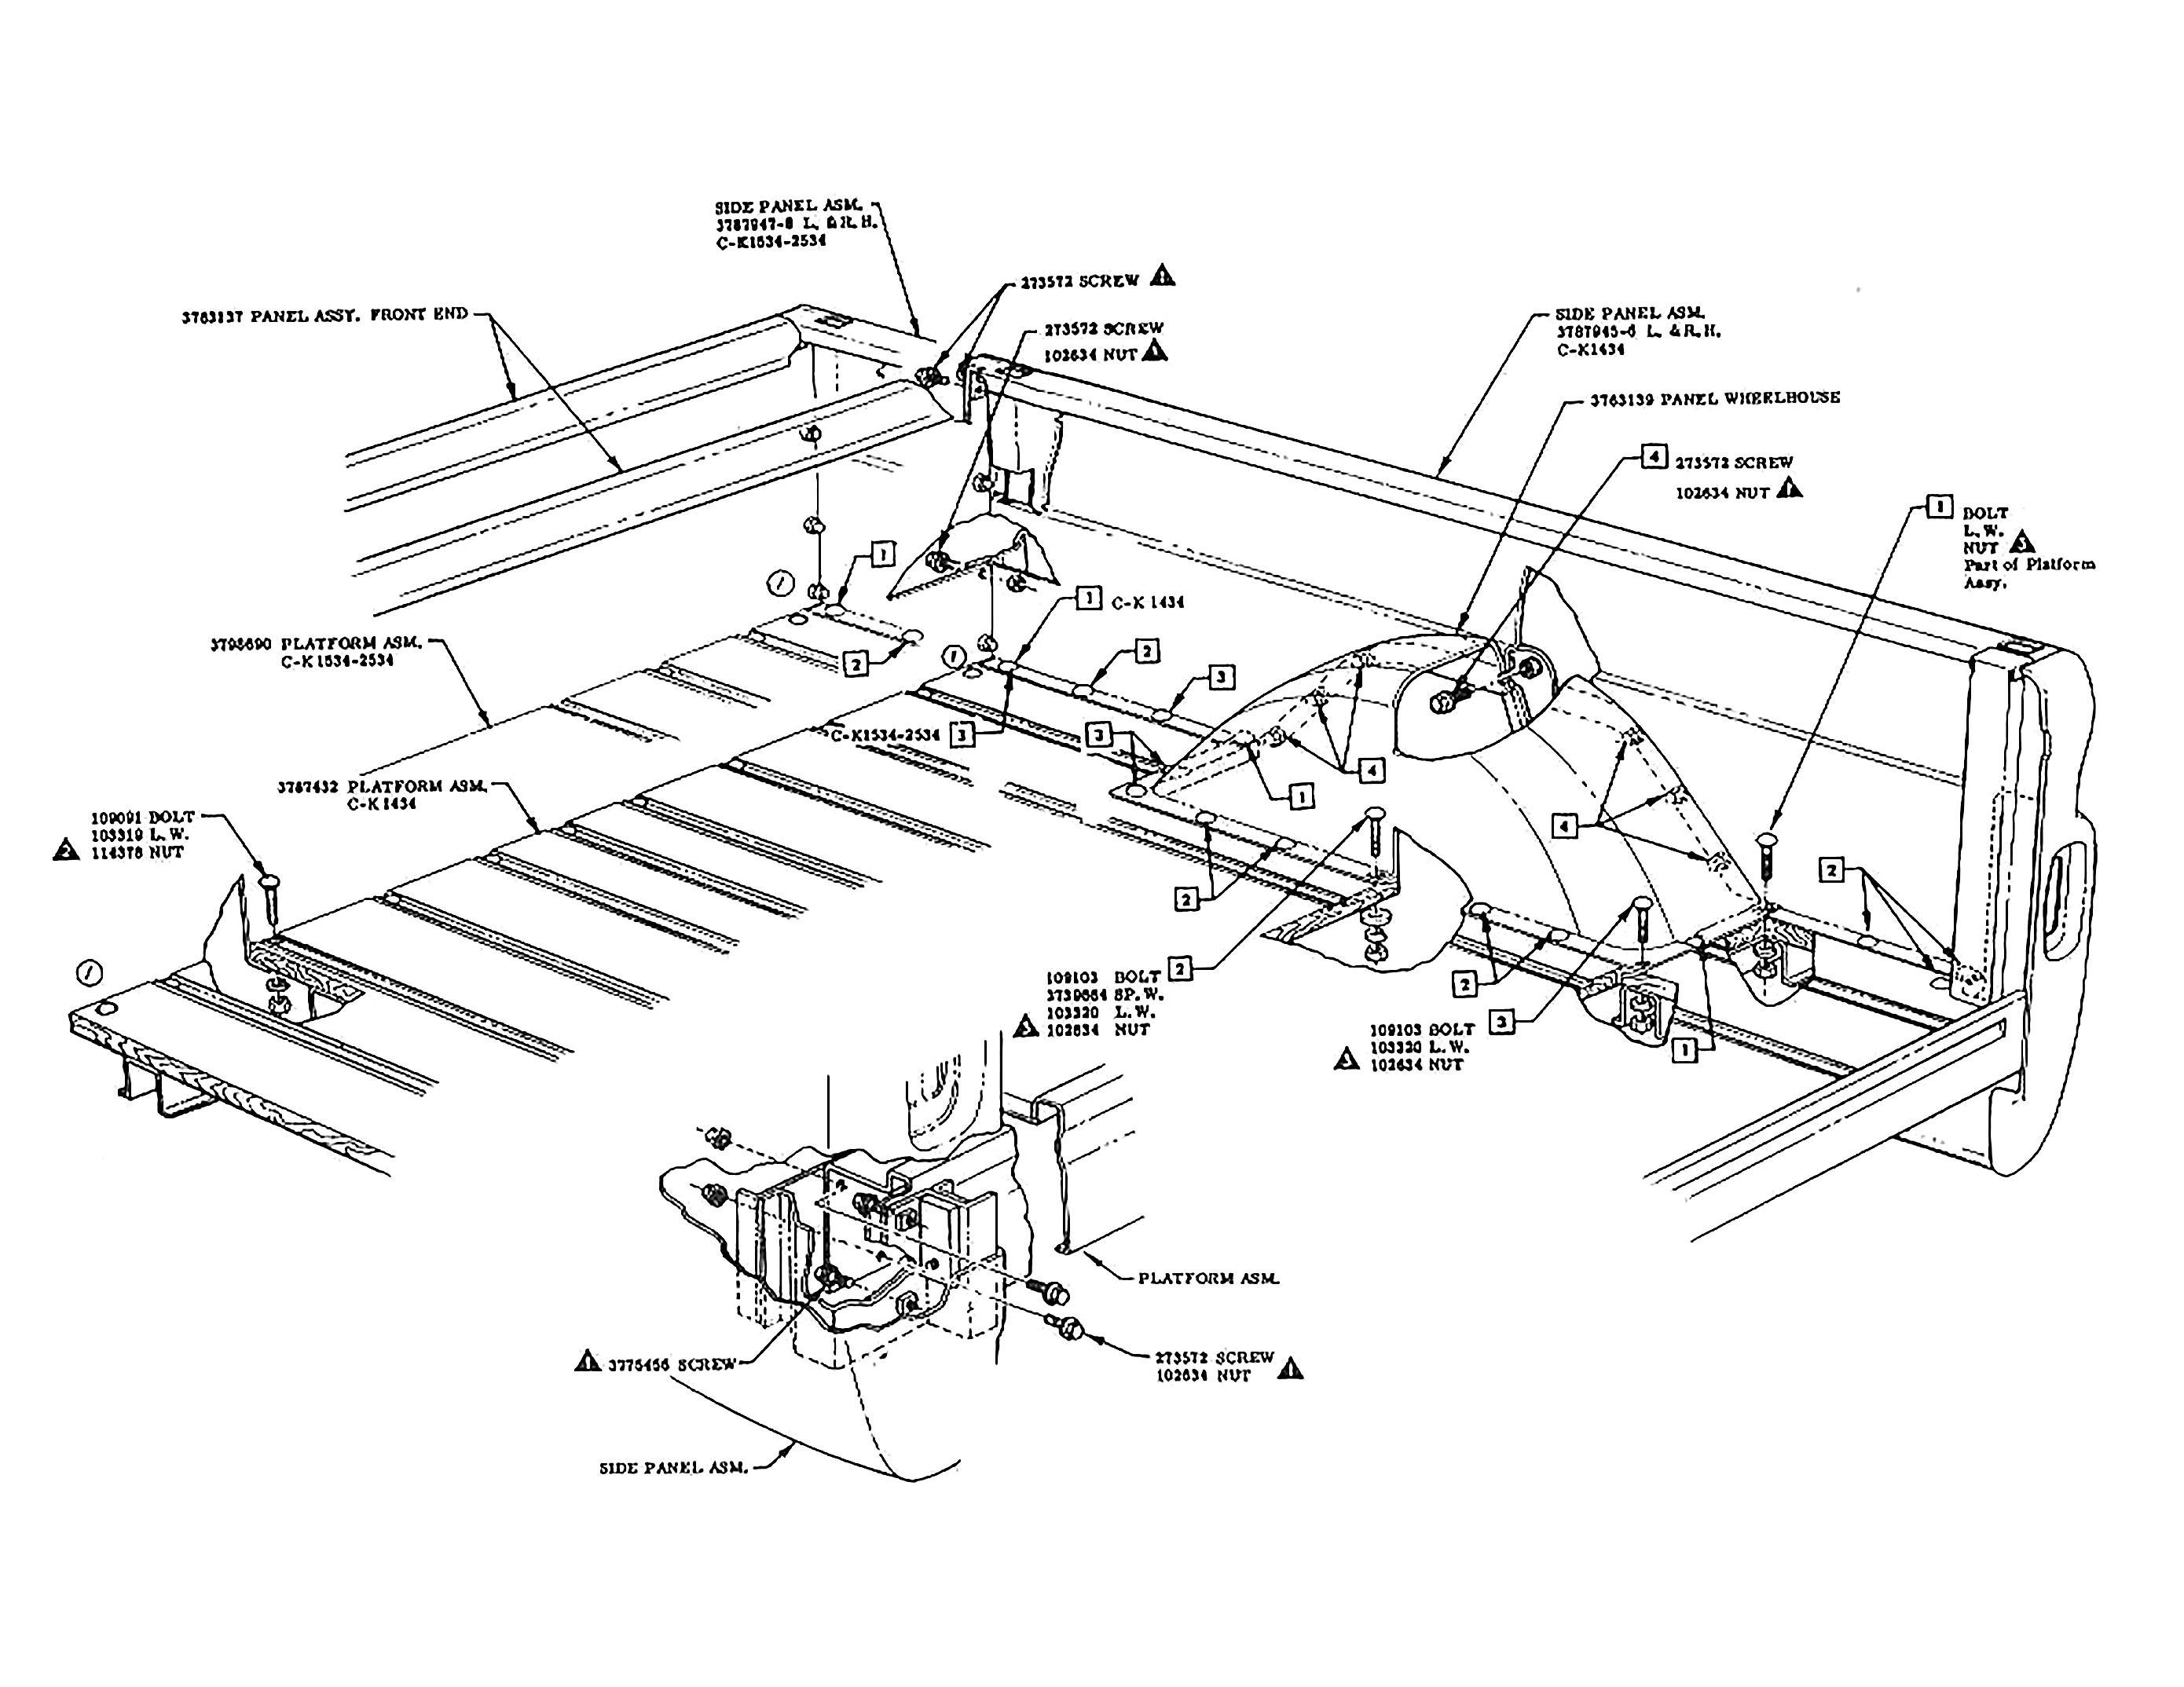 Truck Diagram Parts Bed Fleetside Diagram 60s Chevy C10 Body & Misc Of Truck Diagram Parts